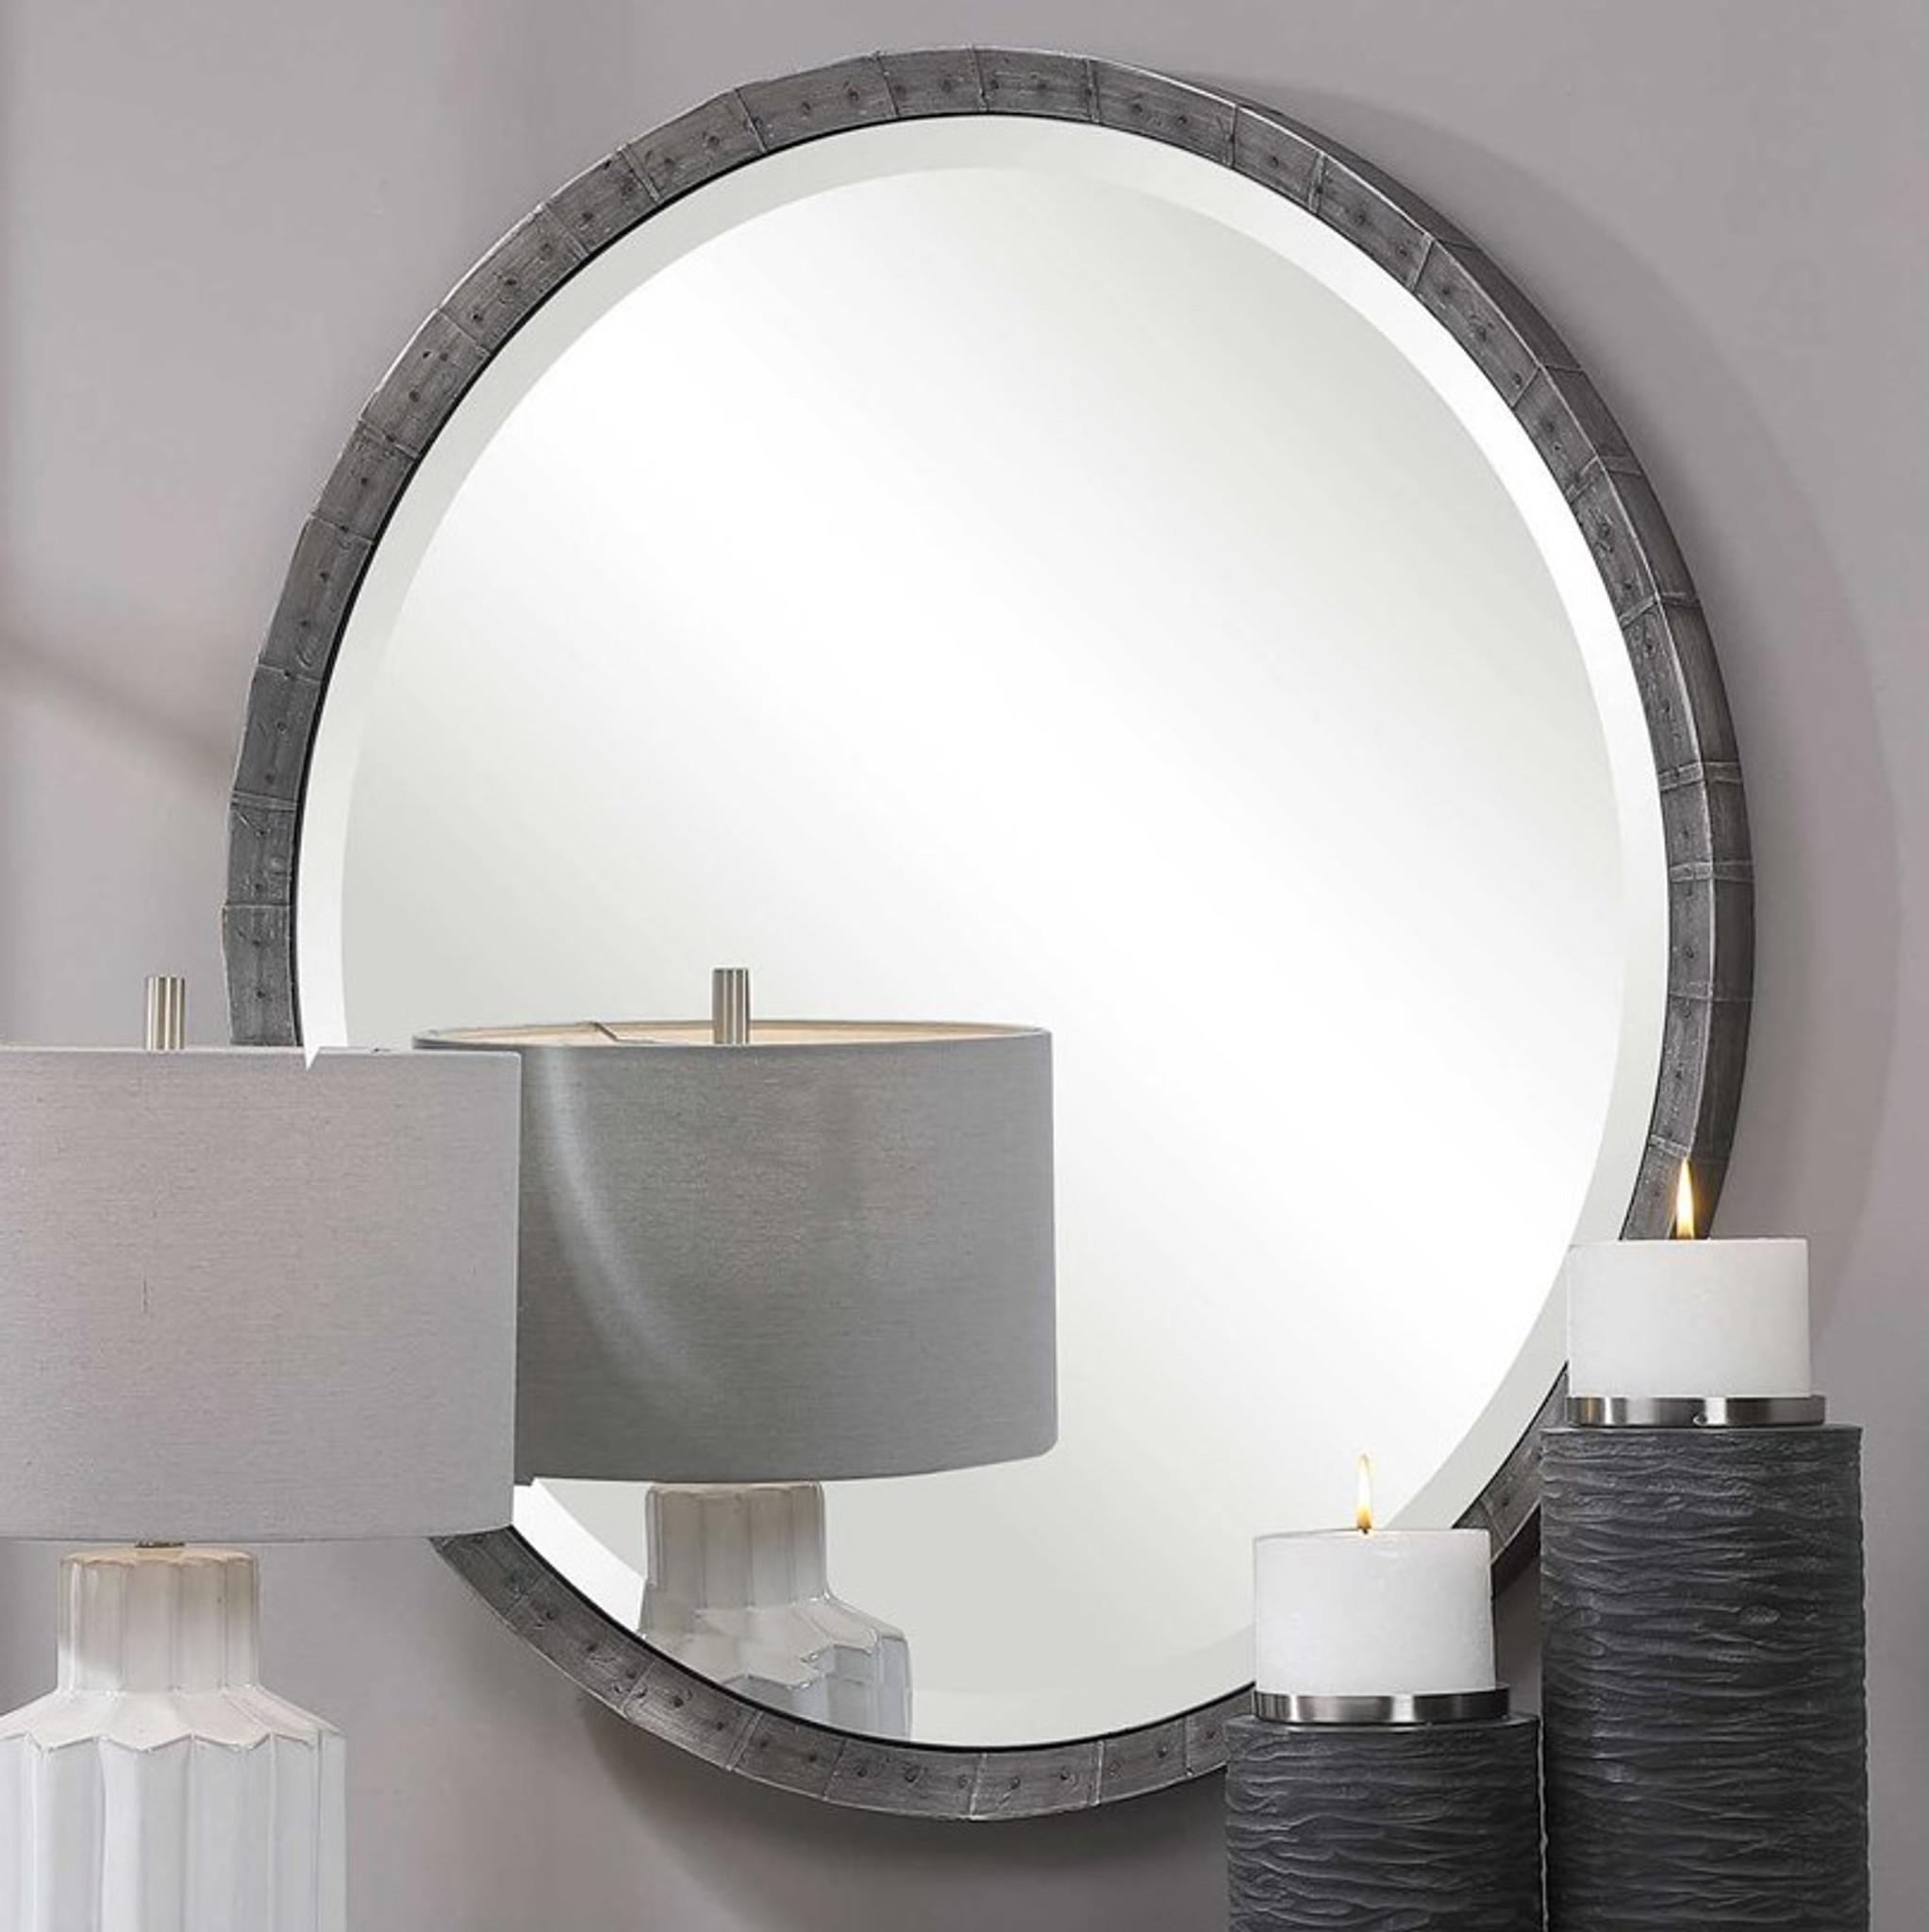 uttermost bartow steel grey industrial style rustic round wall mirror farm